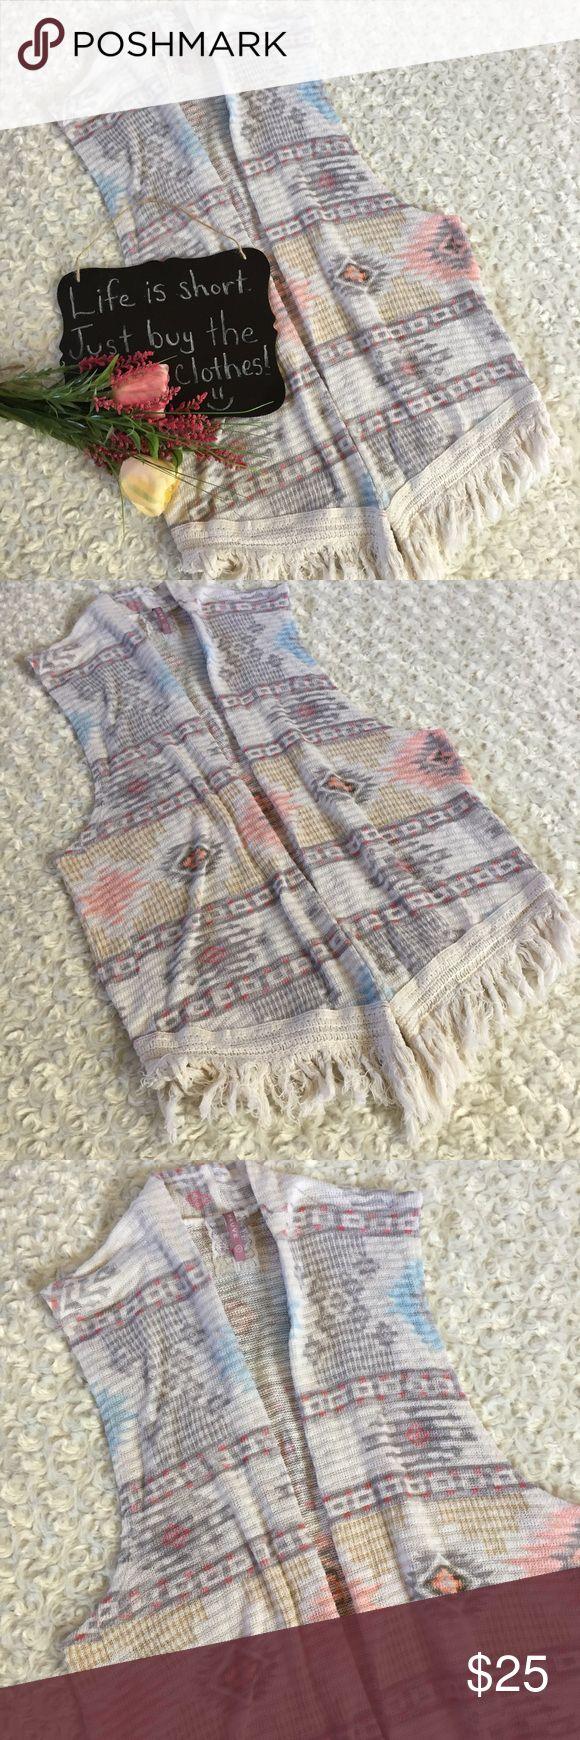 "Mauve aztec print sleeveless cardigan Adorable sleeveless cardigan by Mauve!! Aztec print. Very lightweight sweater material. Size S. 18.5"" arm pit to arm pit. 28.5"" length. Mauve Tops"